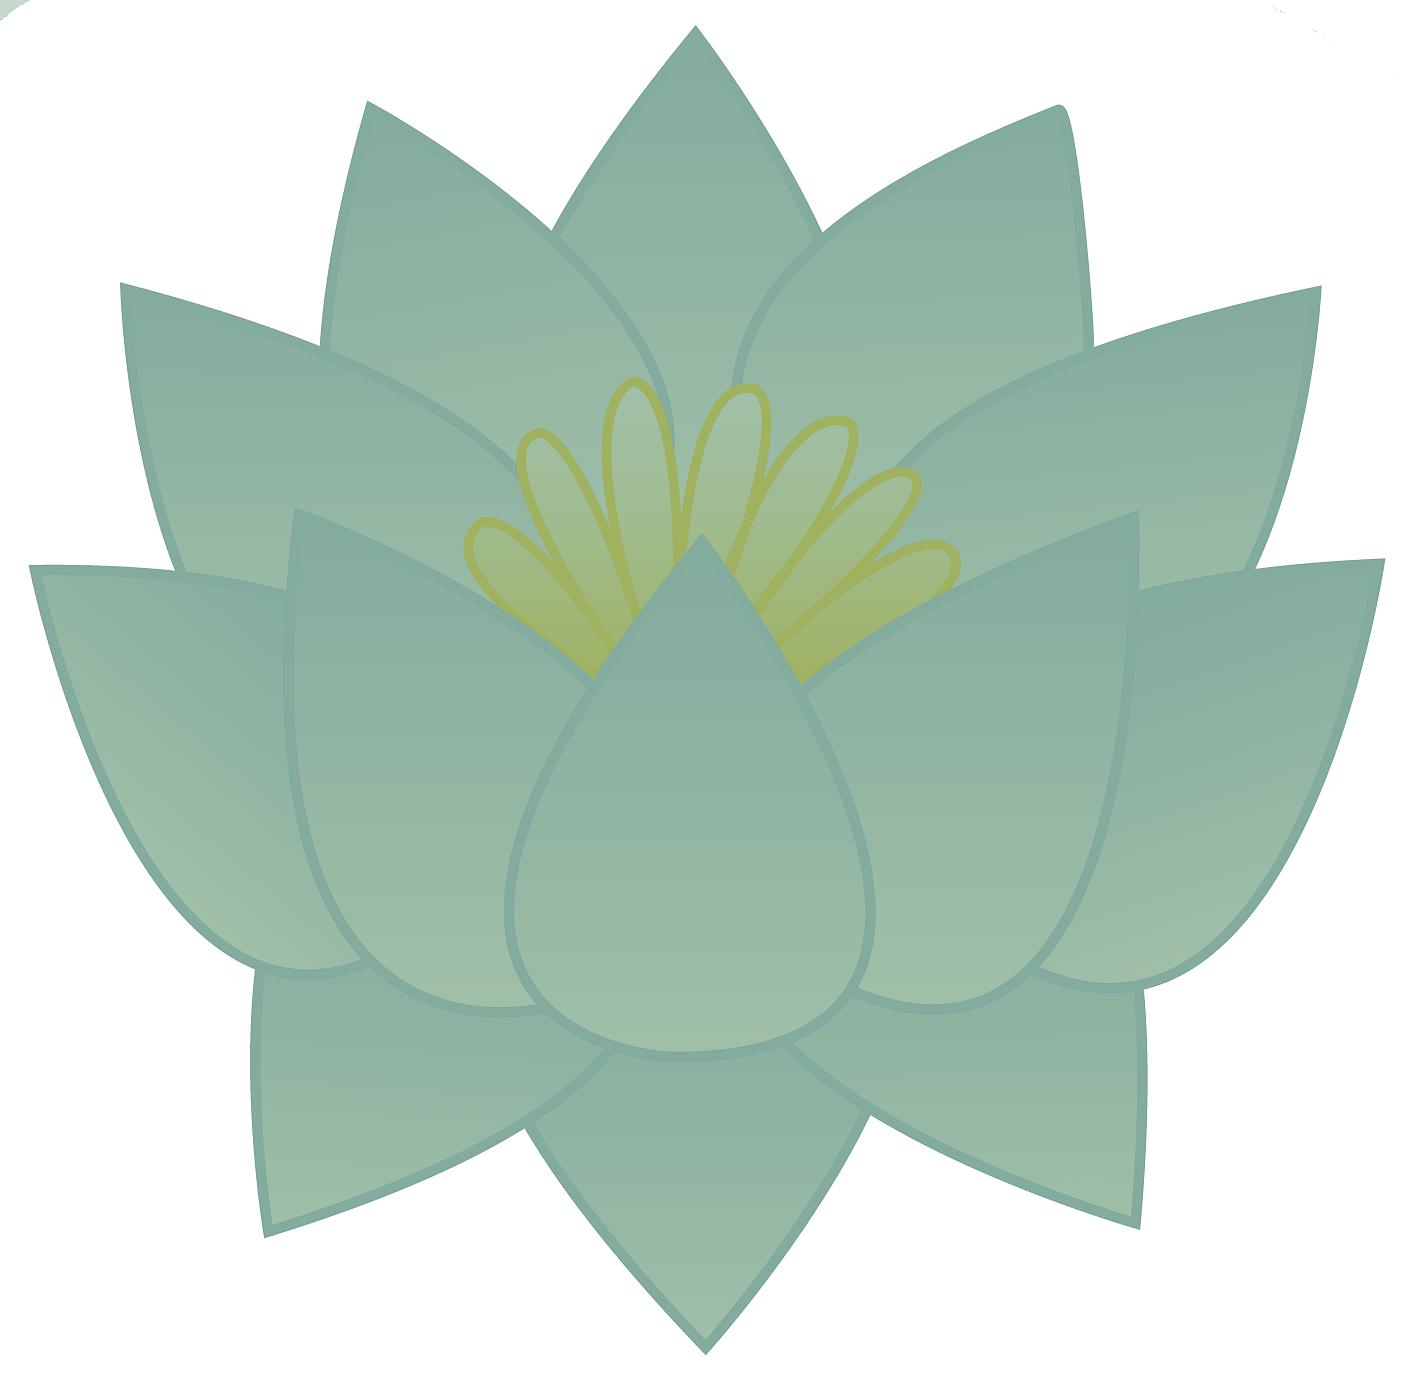 Image lotus flower blueg the naruto world wiki fandom lotus flower blueg izmirmasajfo Choice Image